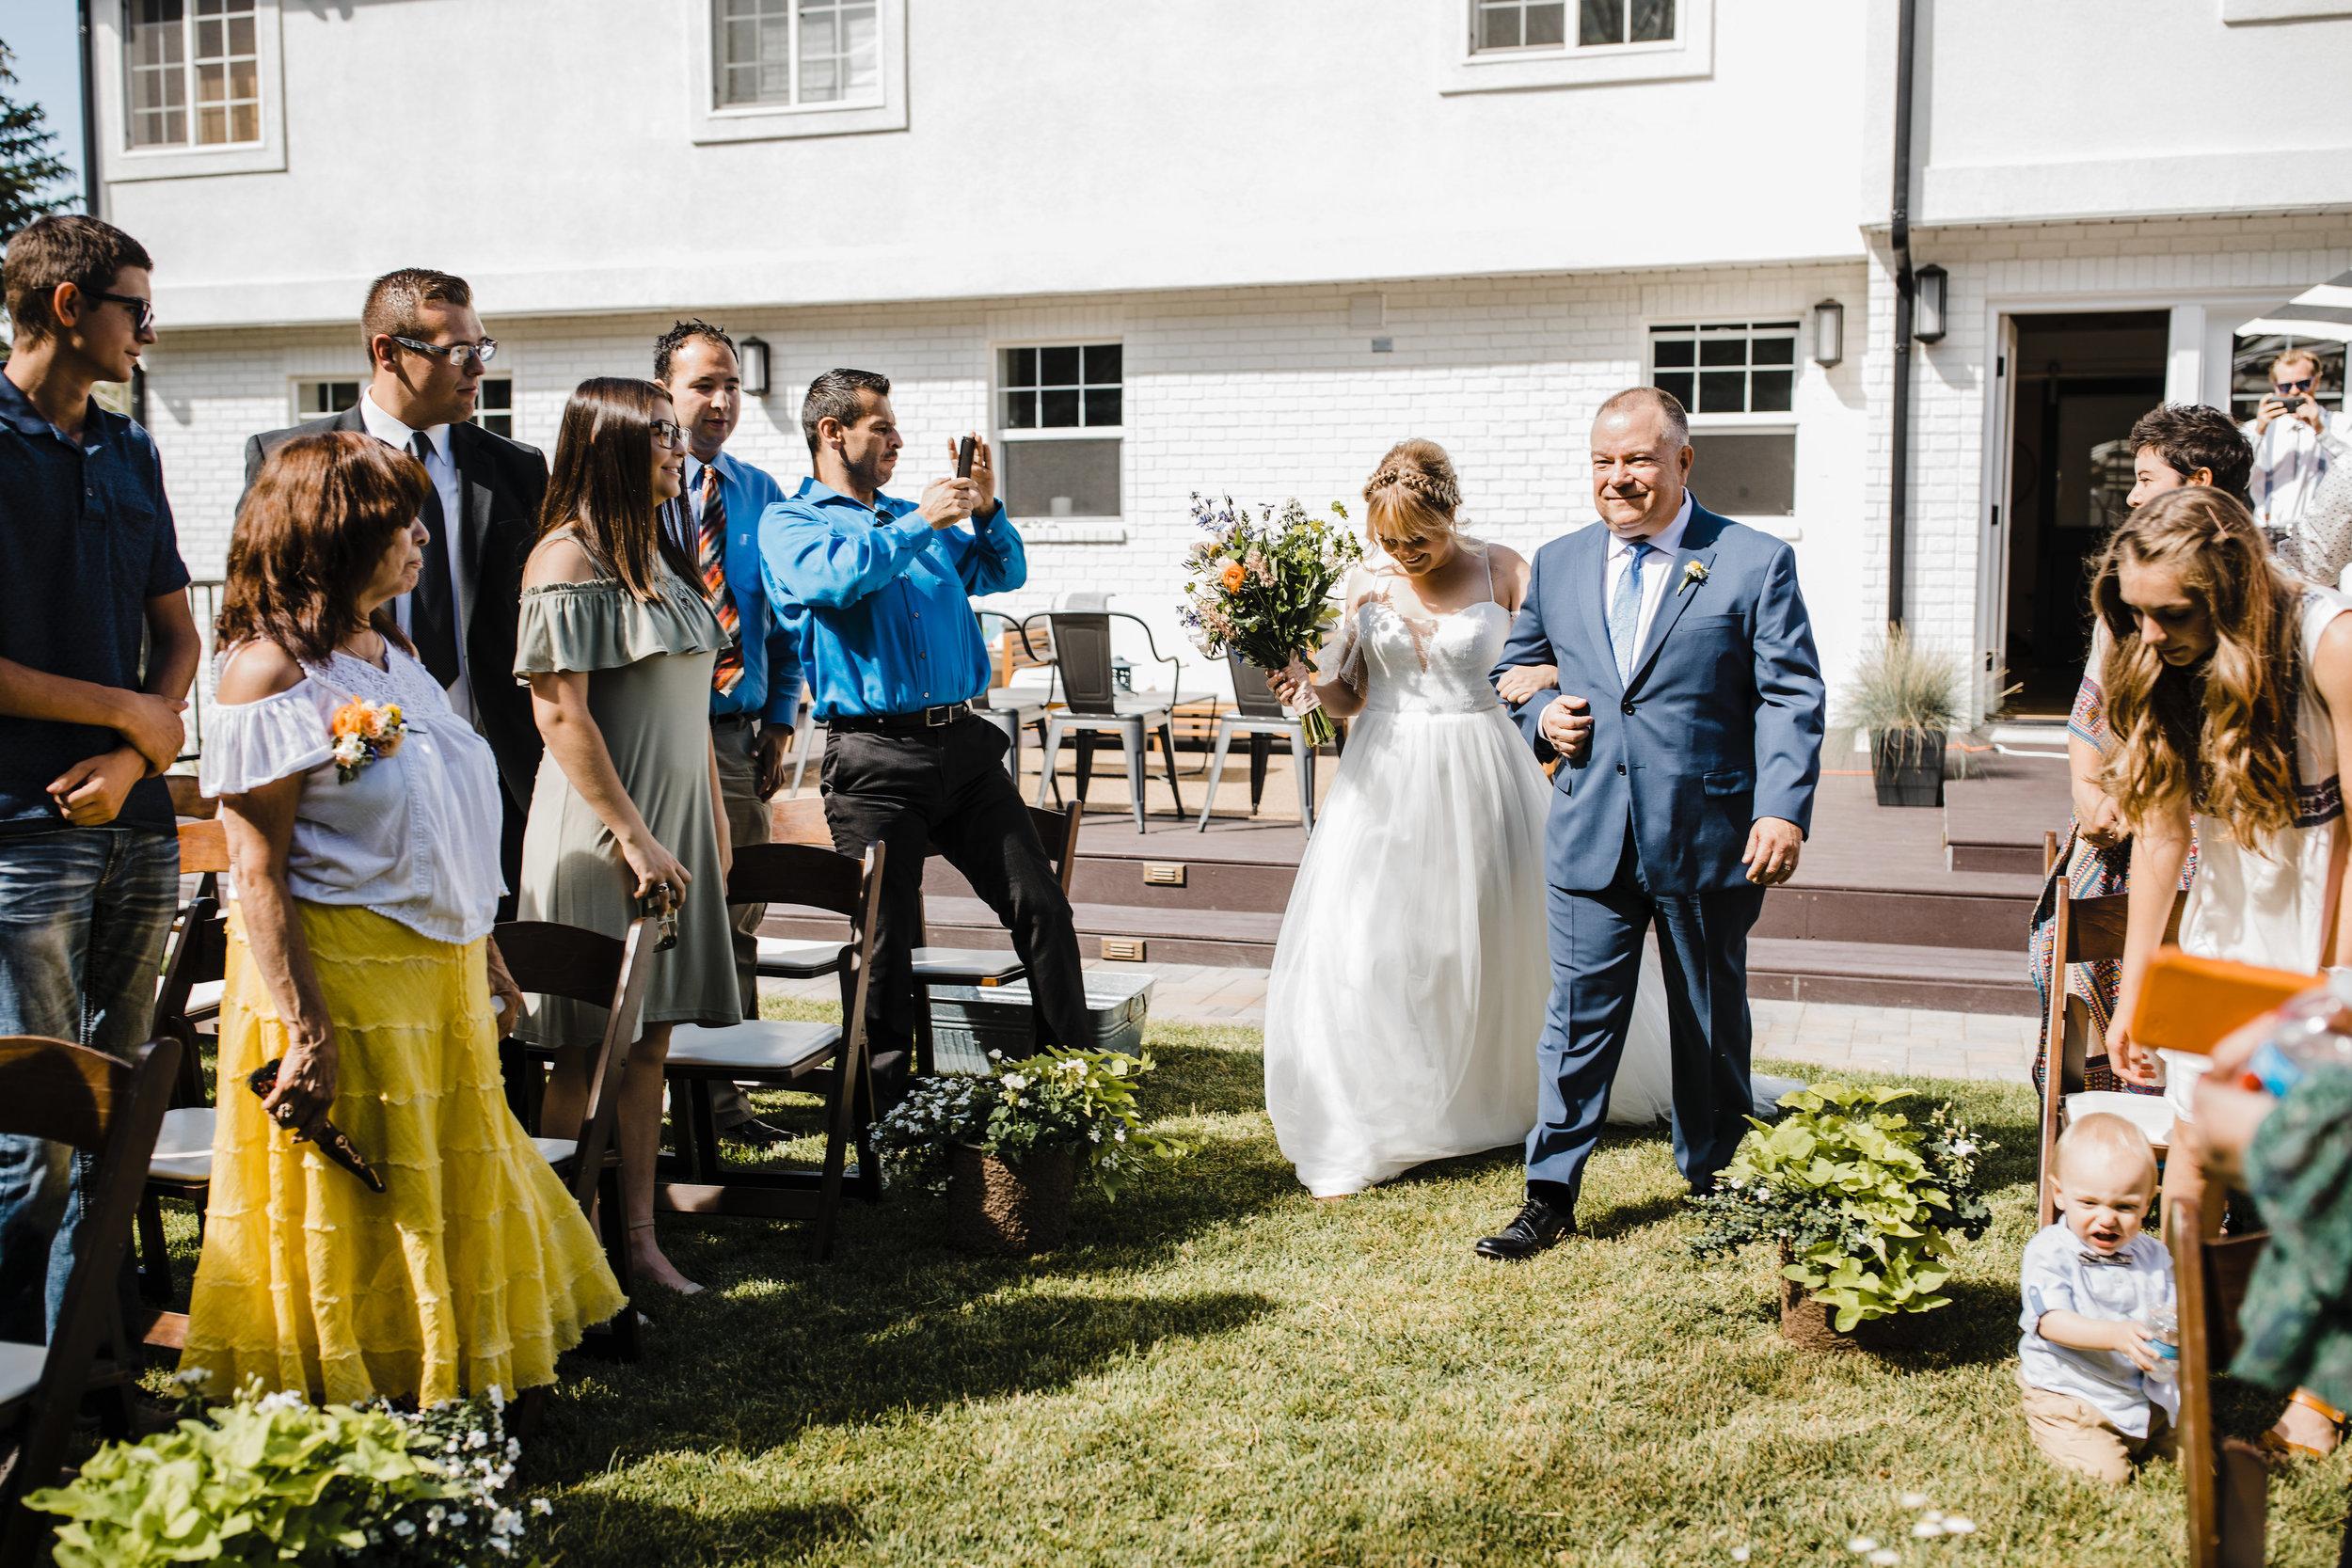 Salt Lake City utah wedding photographer outdoor wedding bohemian chic wedding aisle wildflower bouquet